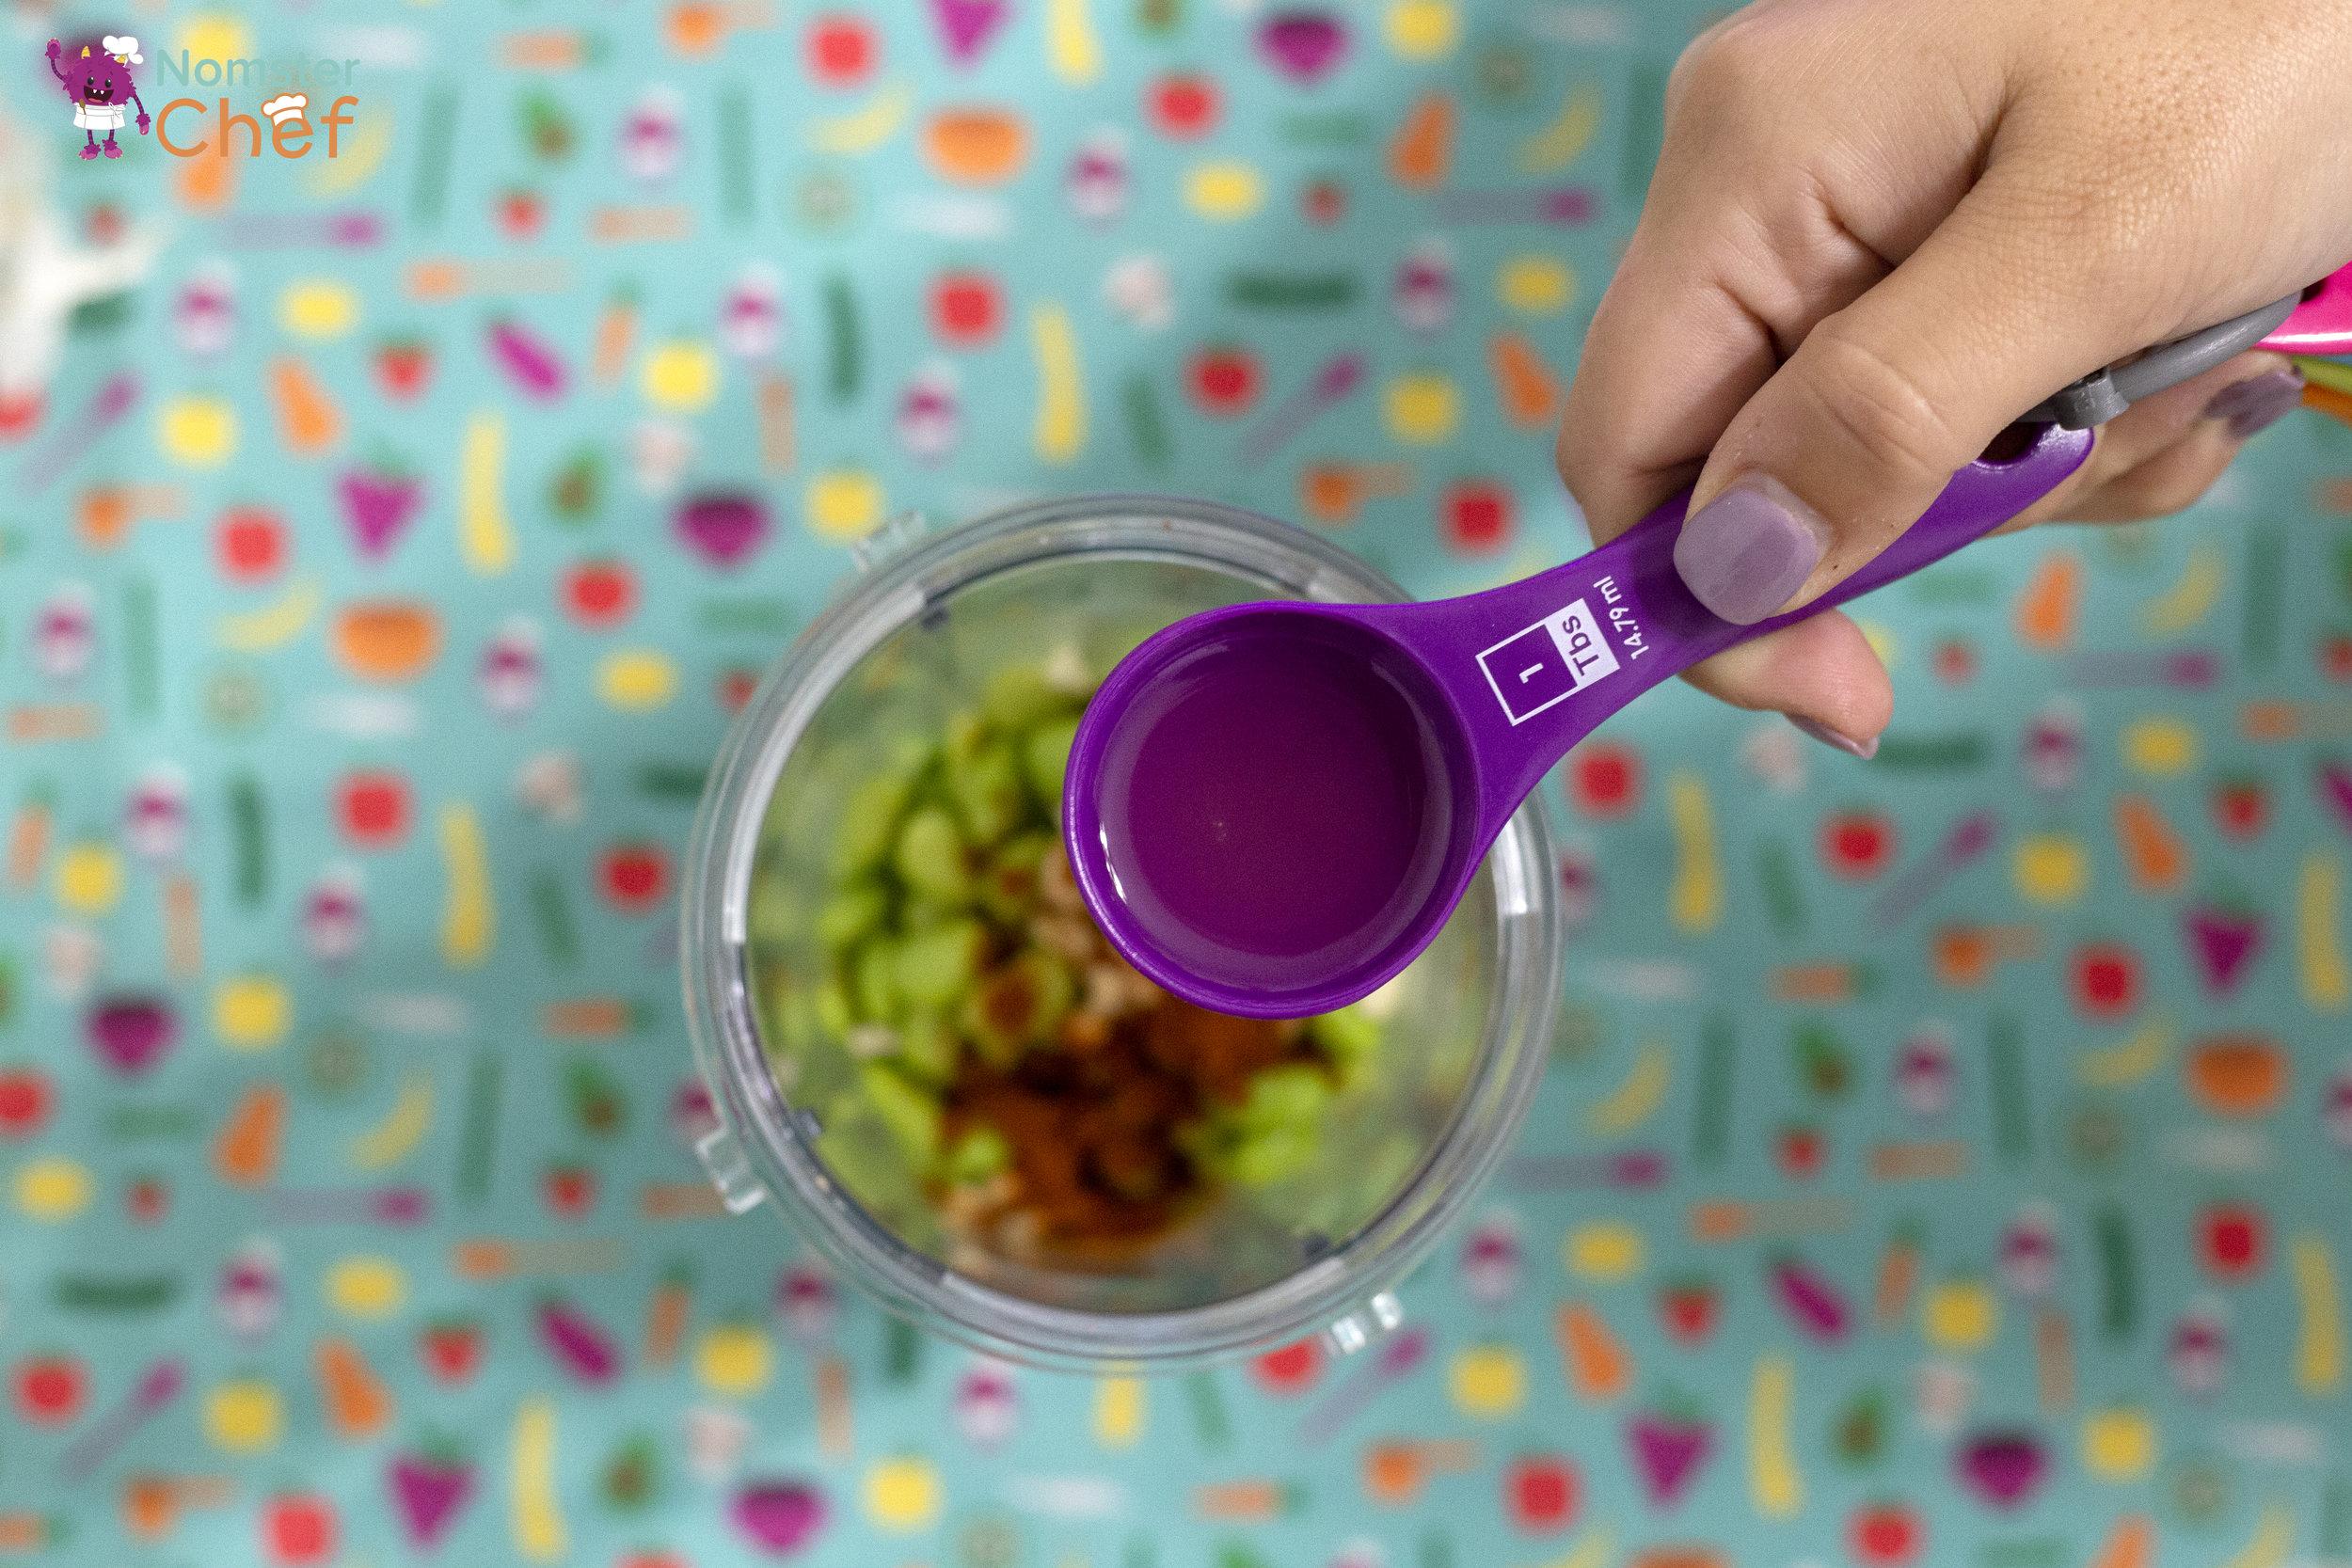 Kitchen_Vocabulary_Garlic-Cloves_Edamame Dip_59 copy.jpg